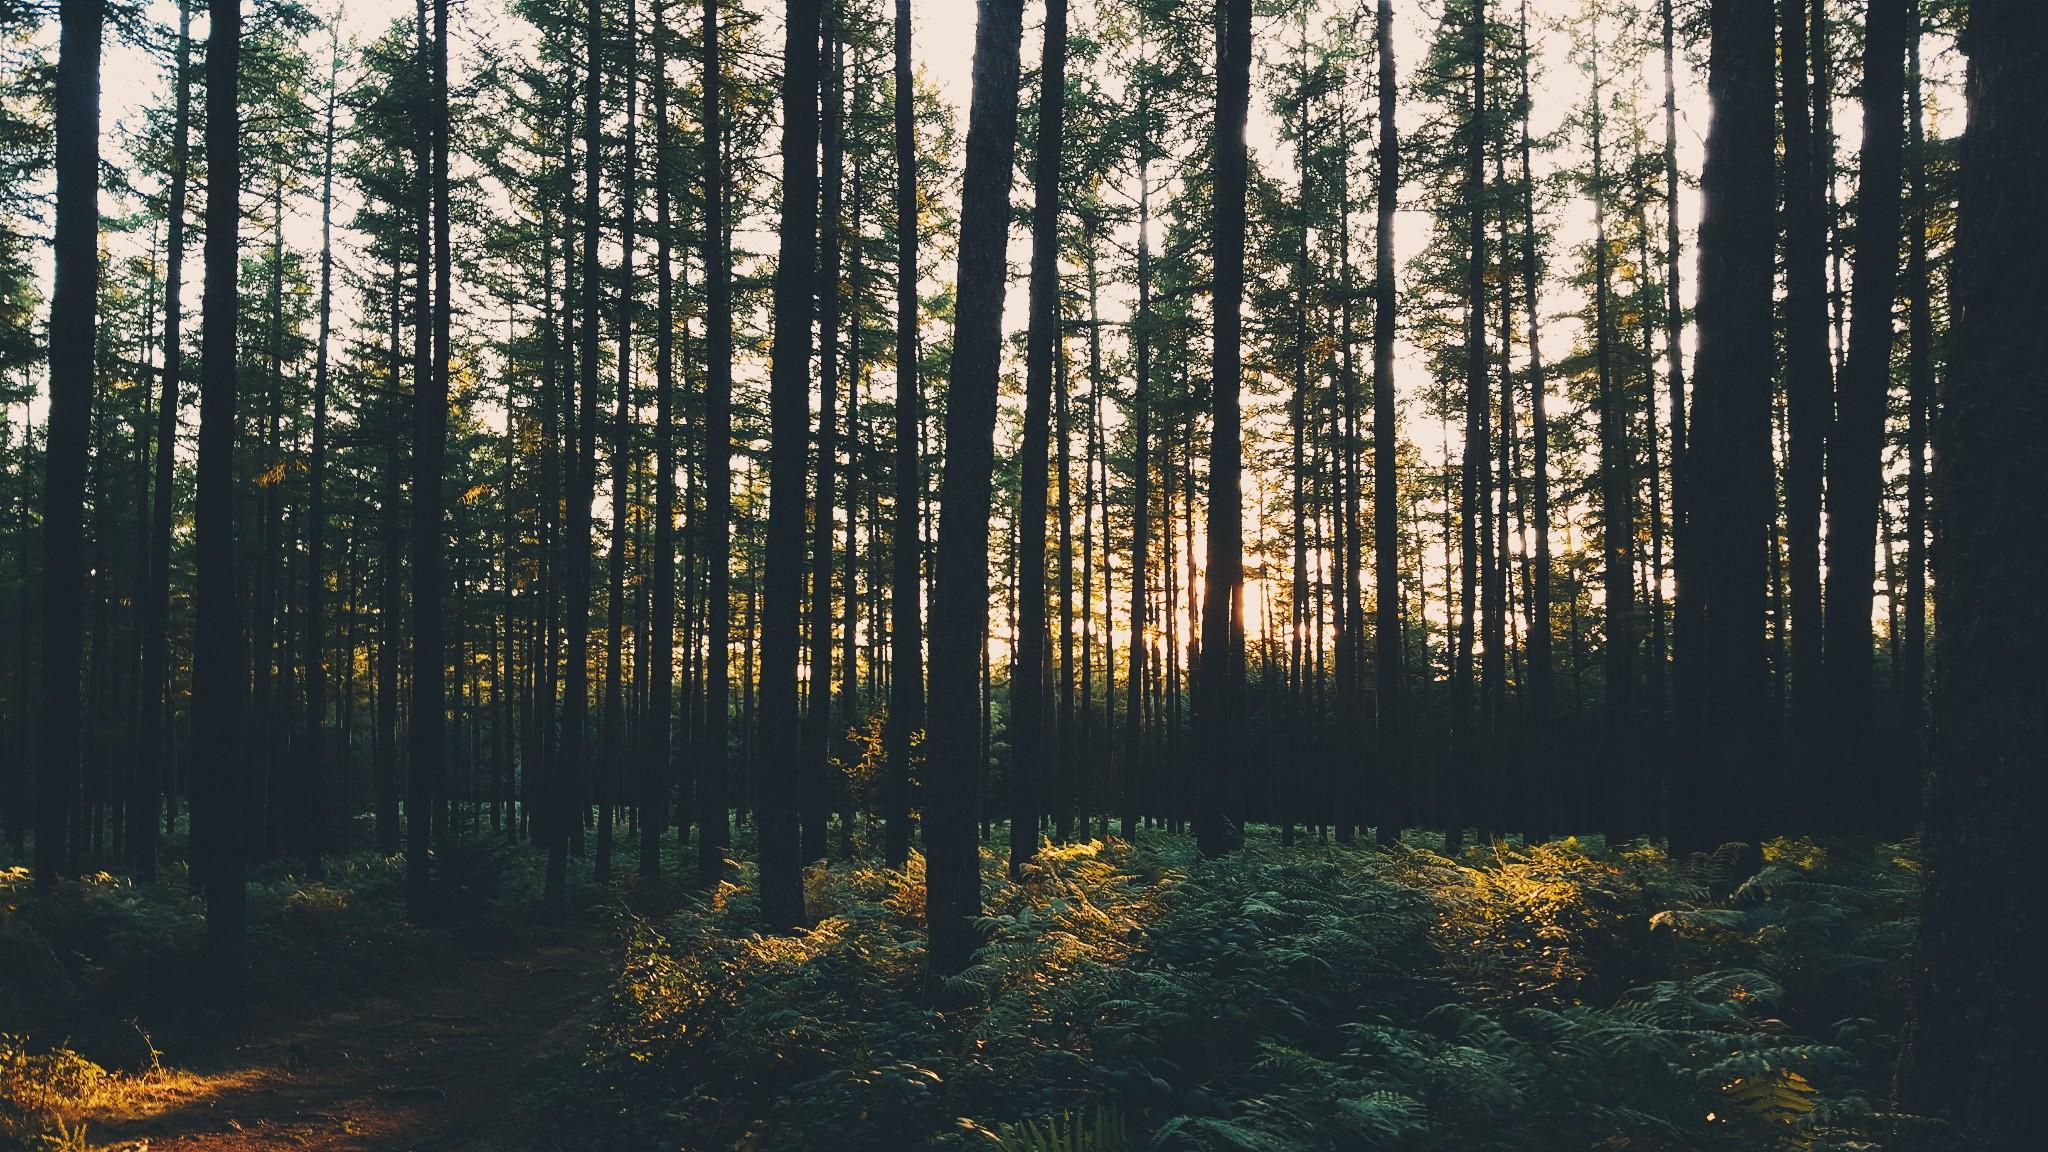 Fondos de pantalla  luz de sol rboles paisaje bosque